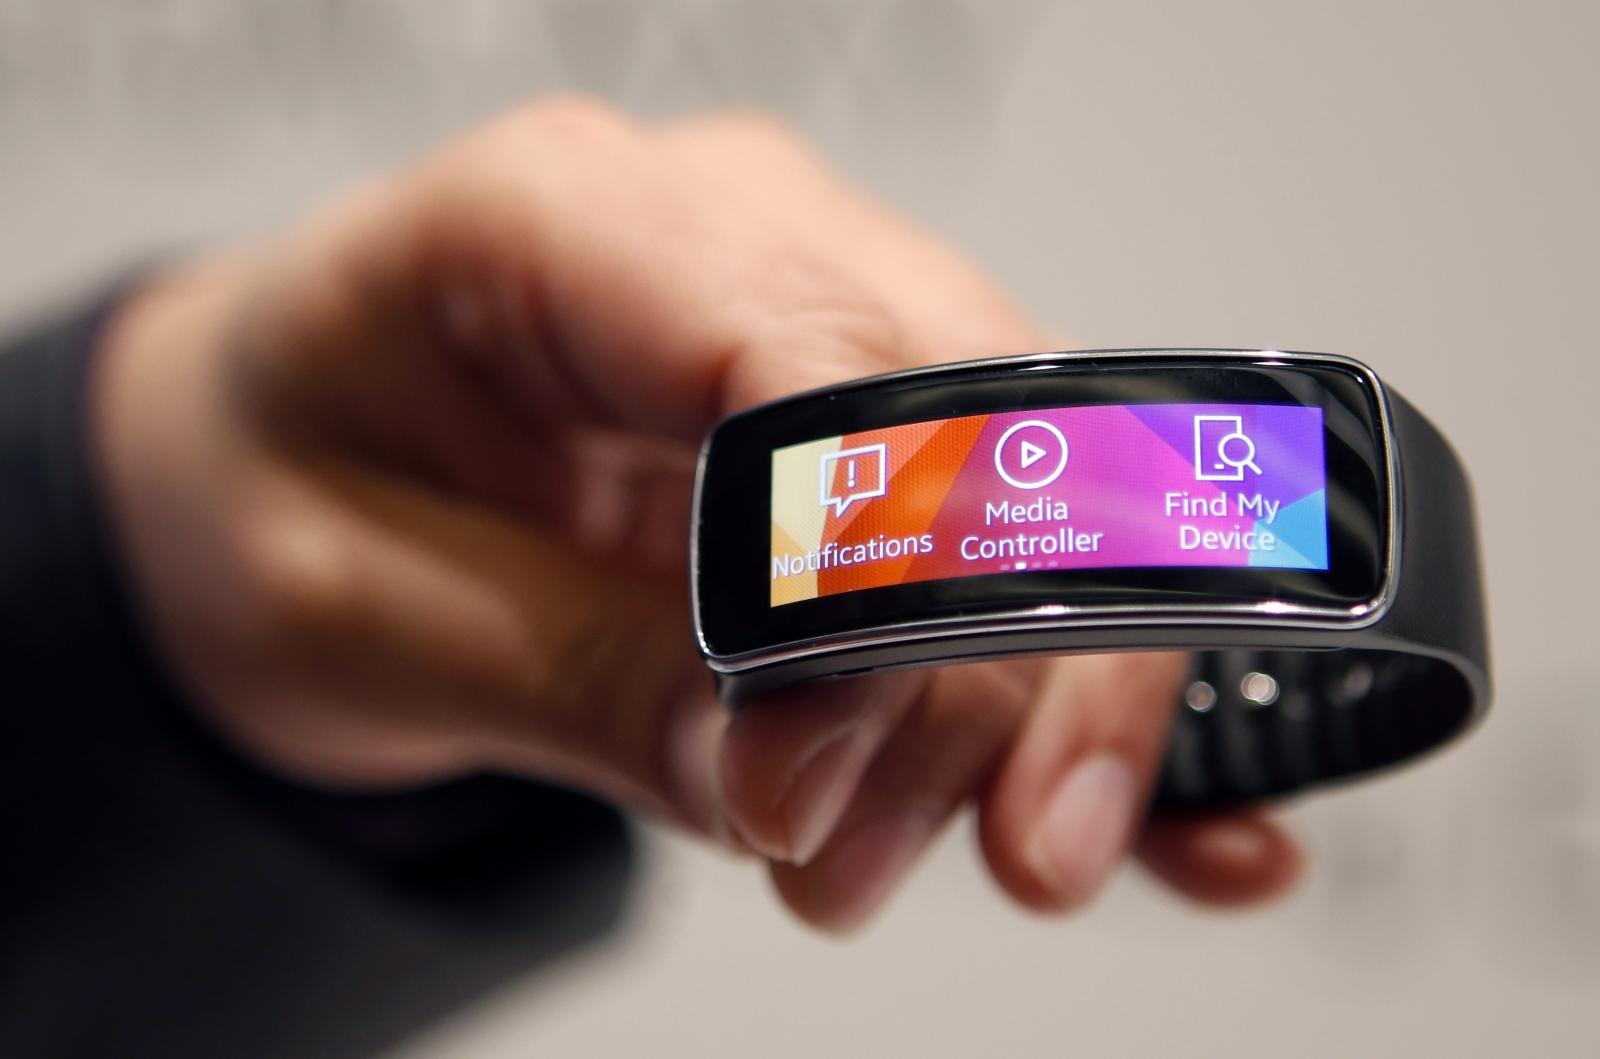 Samsung announces 2 June event in NewYork